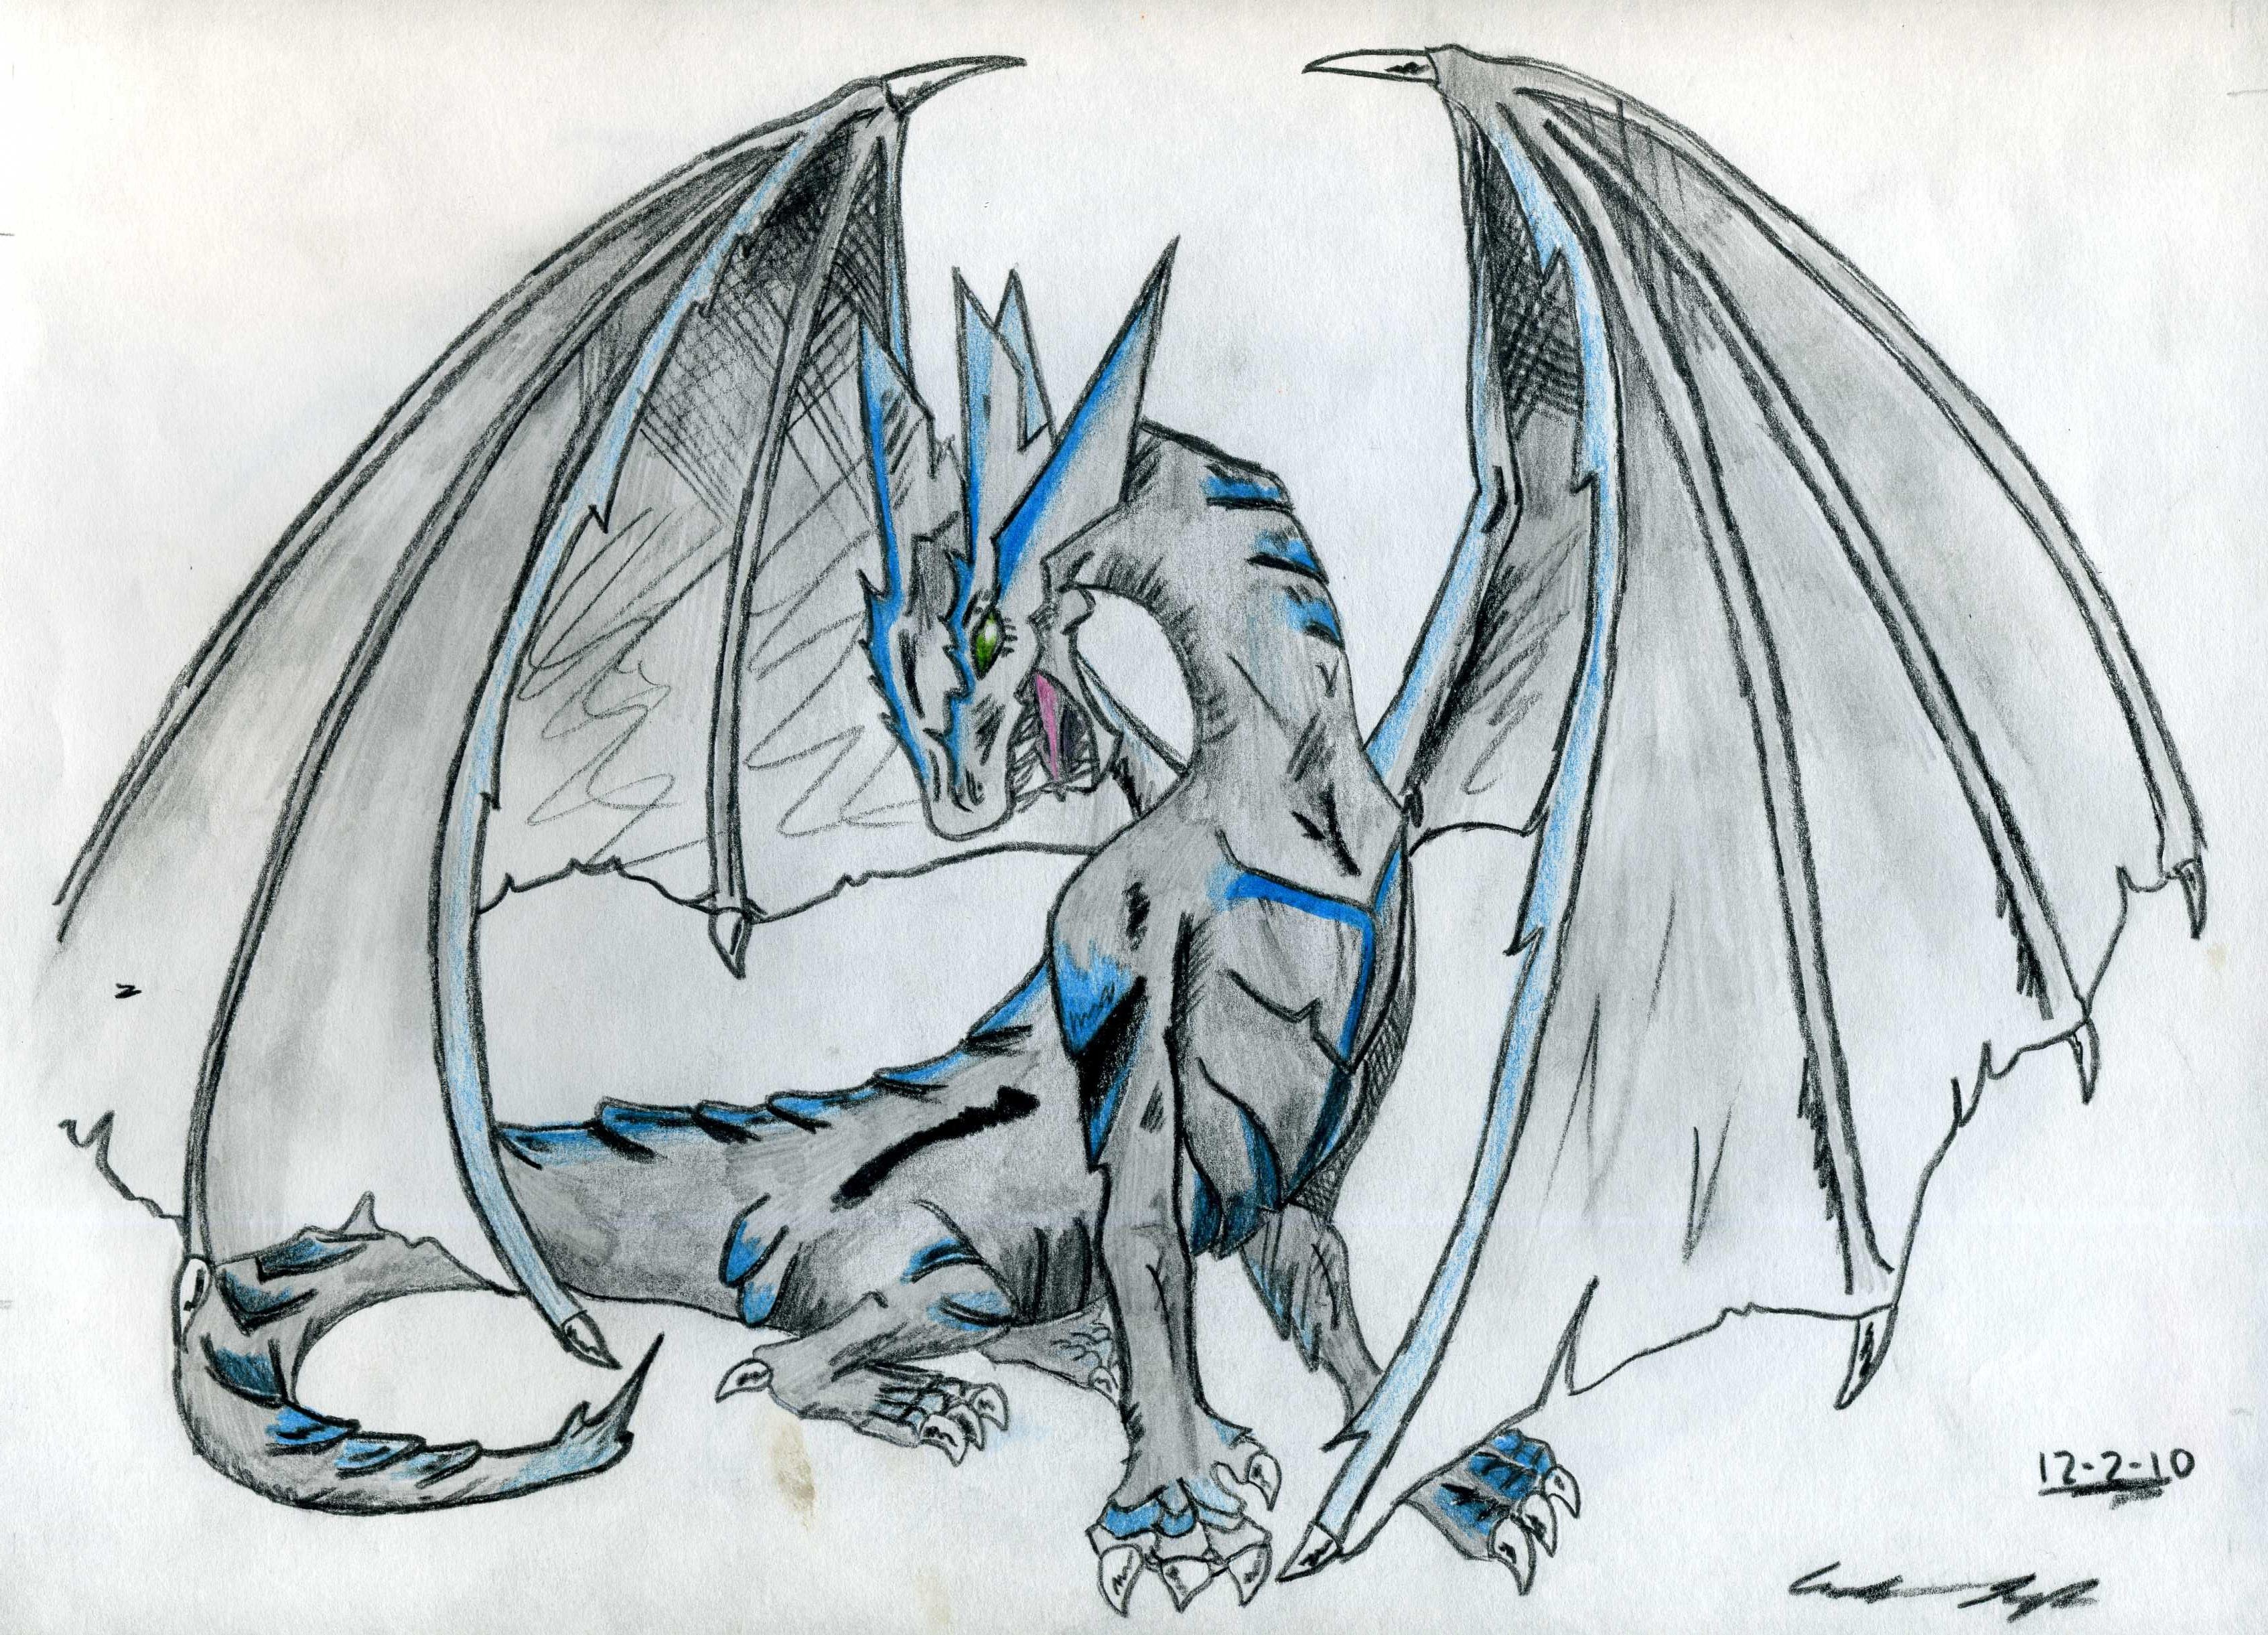 Ice Dragon by Wyldfire7 on DeviantArt